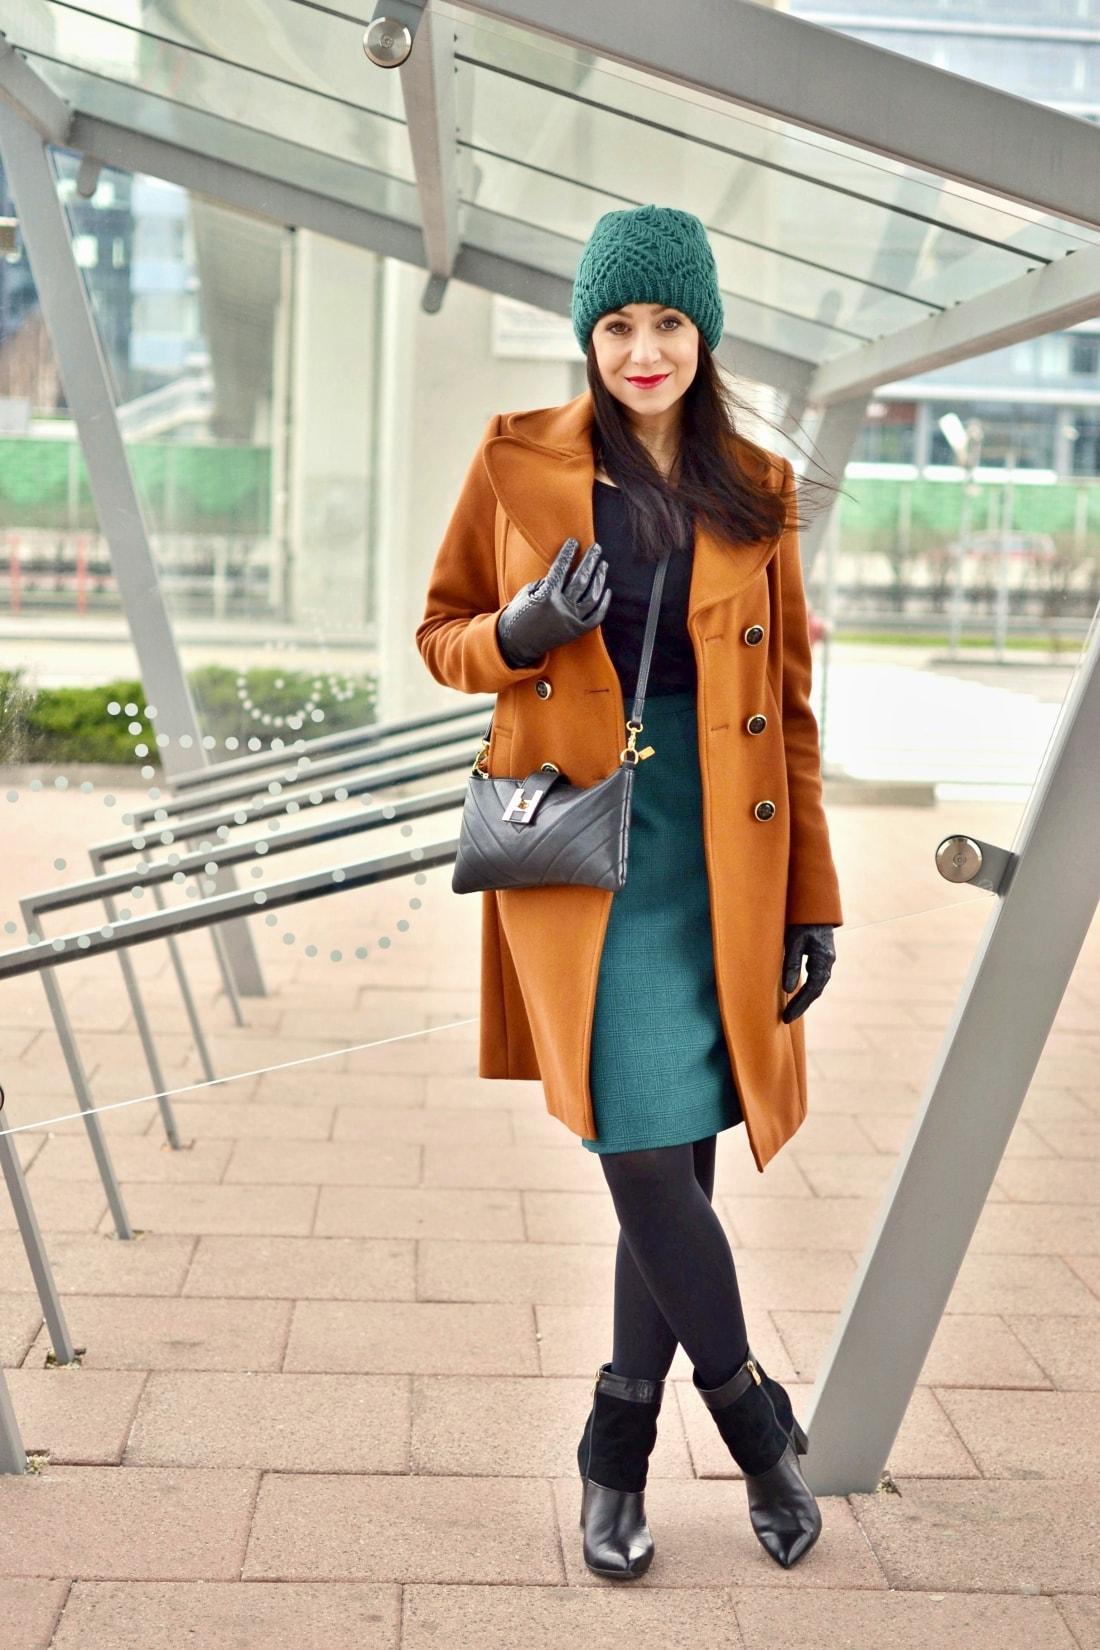 katharine-fashion-is-beautiful-blog-sukna-outfit-6